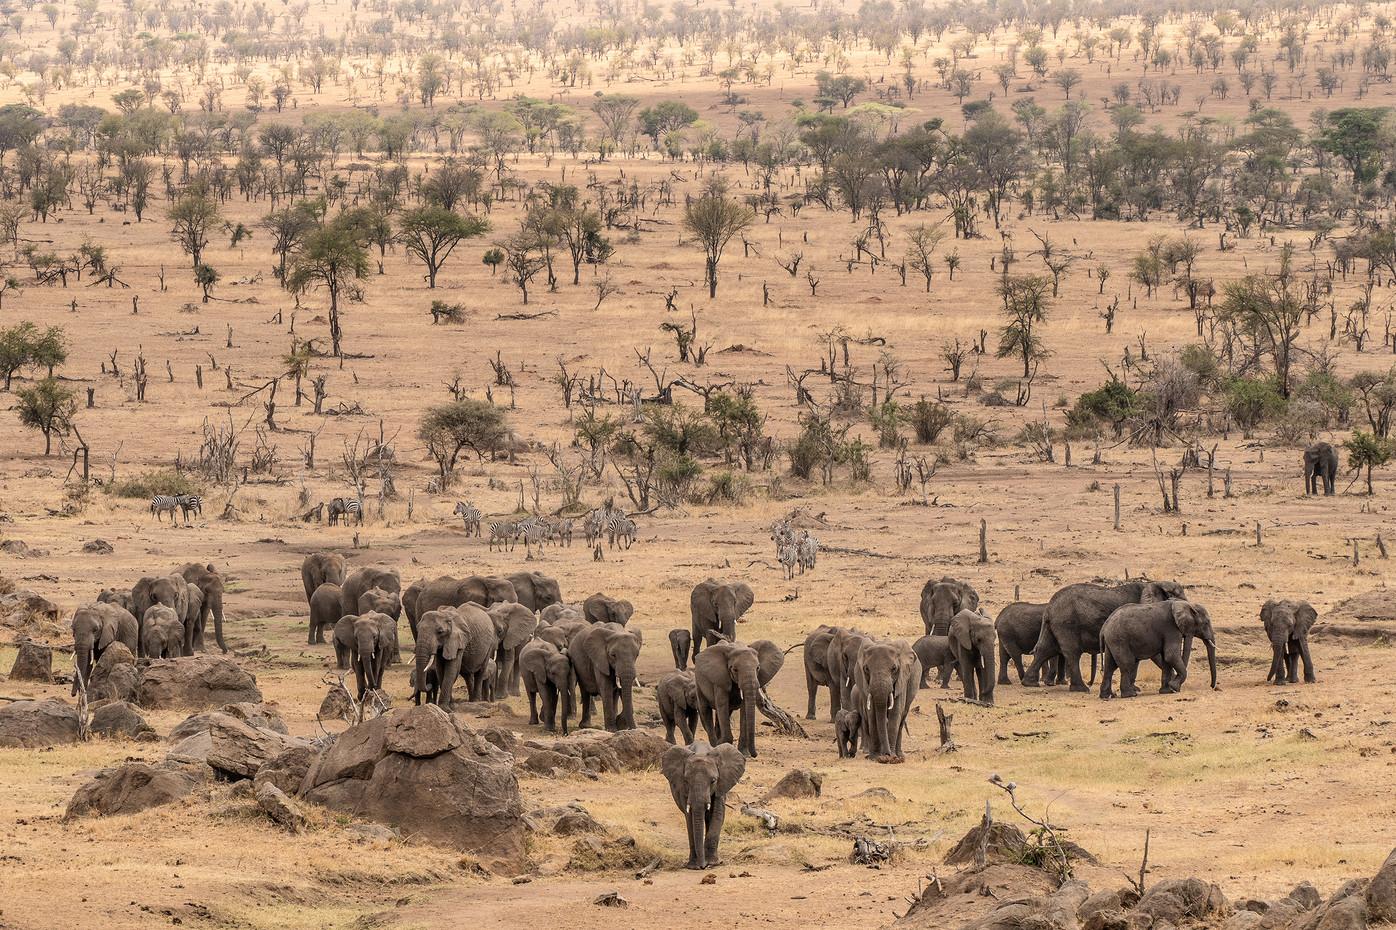 Elephant herds in the Serengeti NP, Tanzania